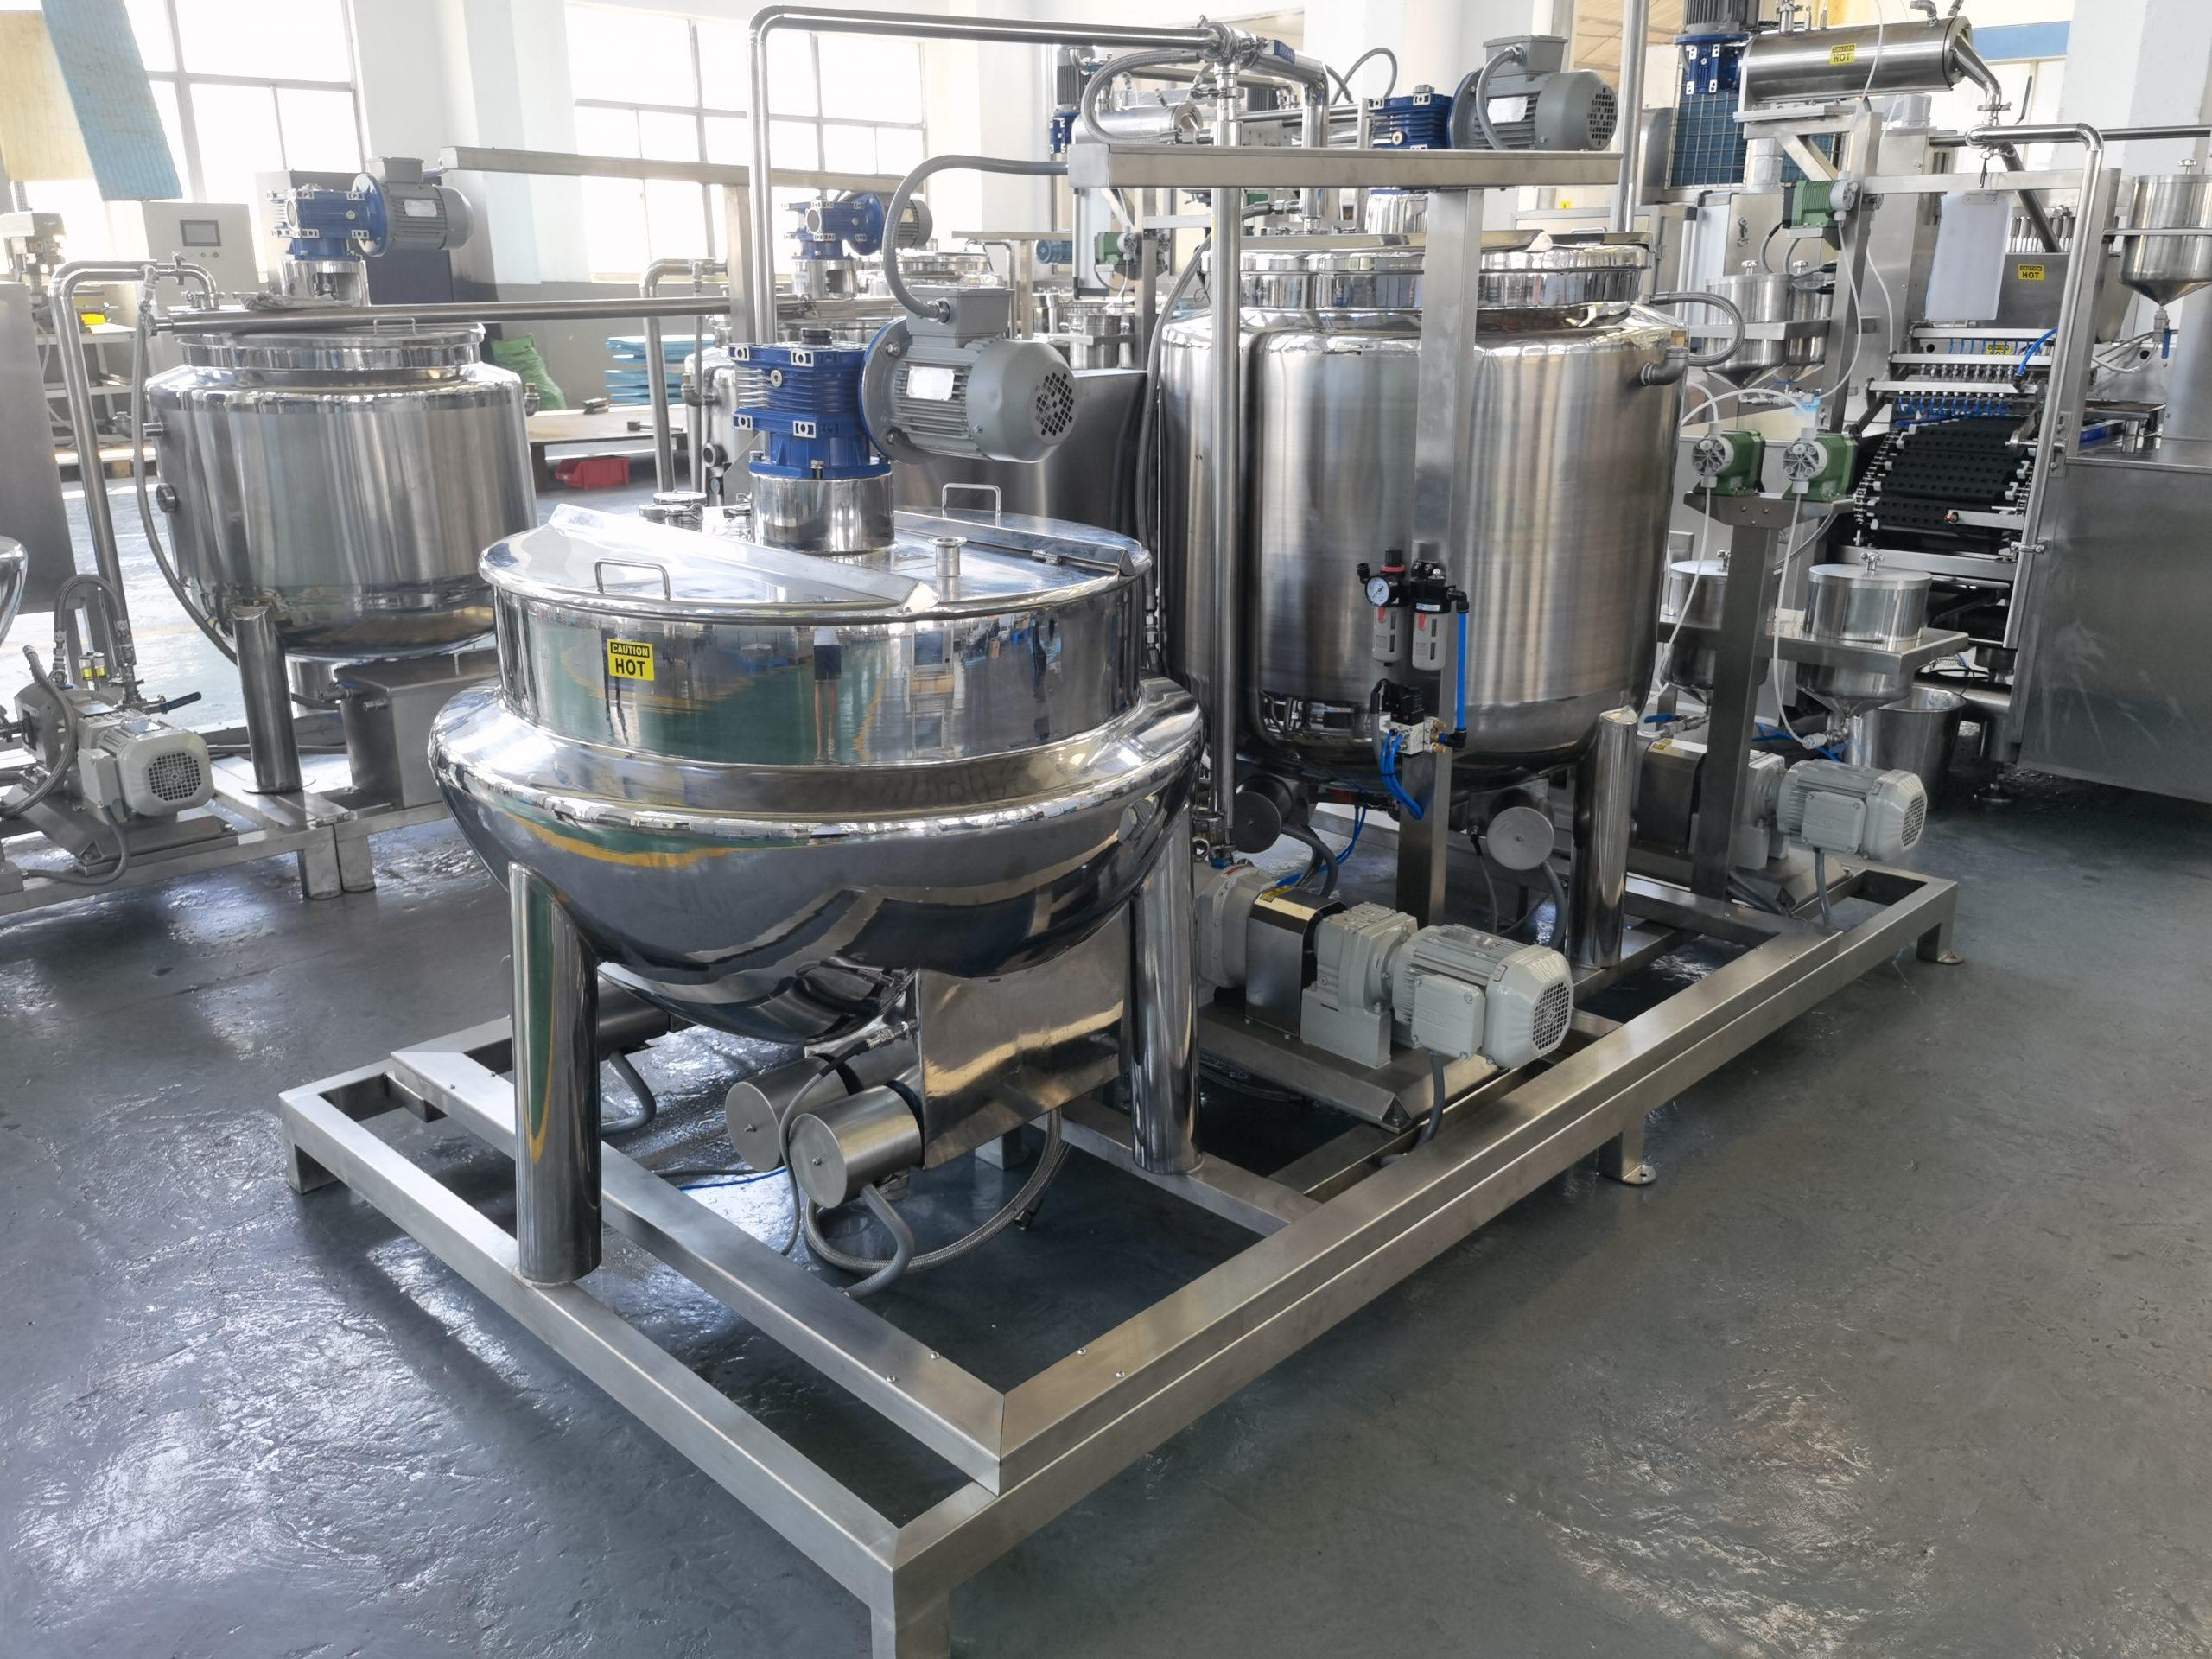 G80 Automatic Gummy Production Equipment details-